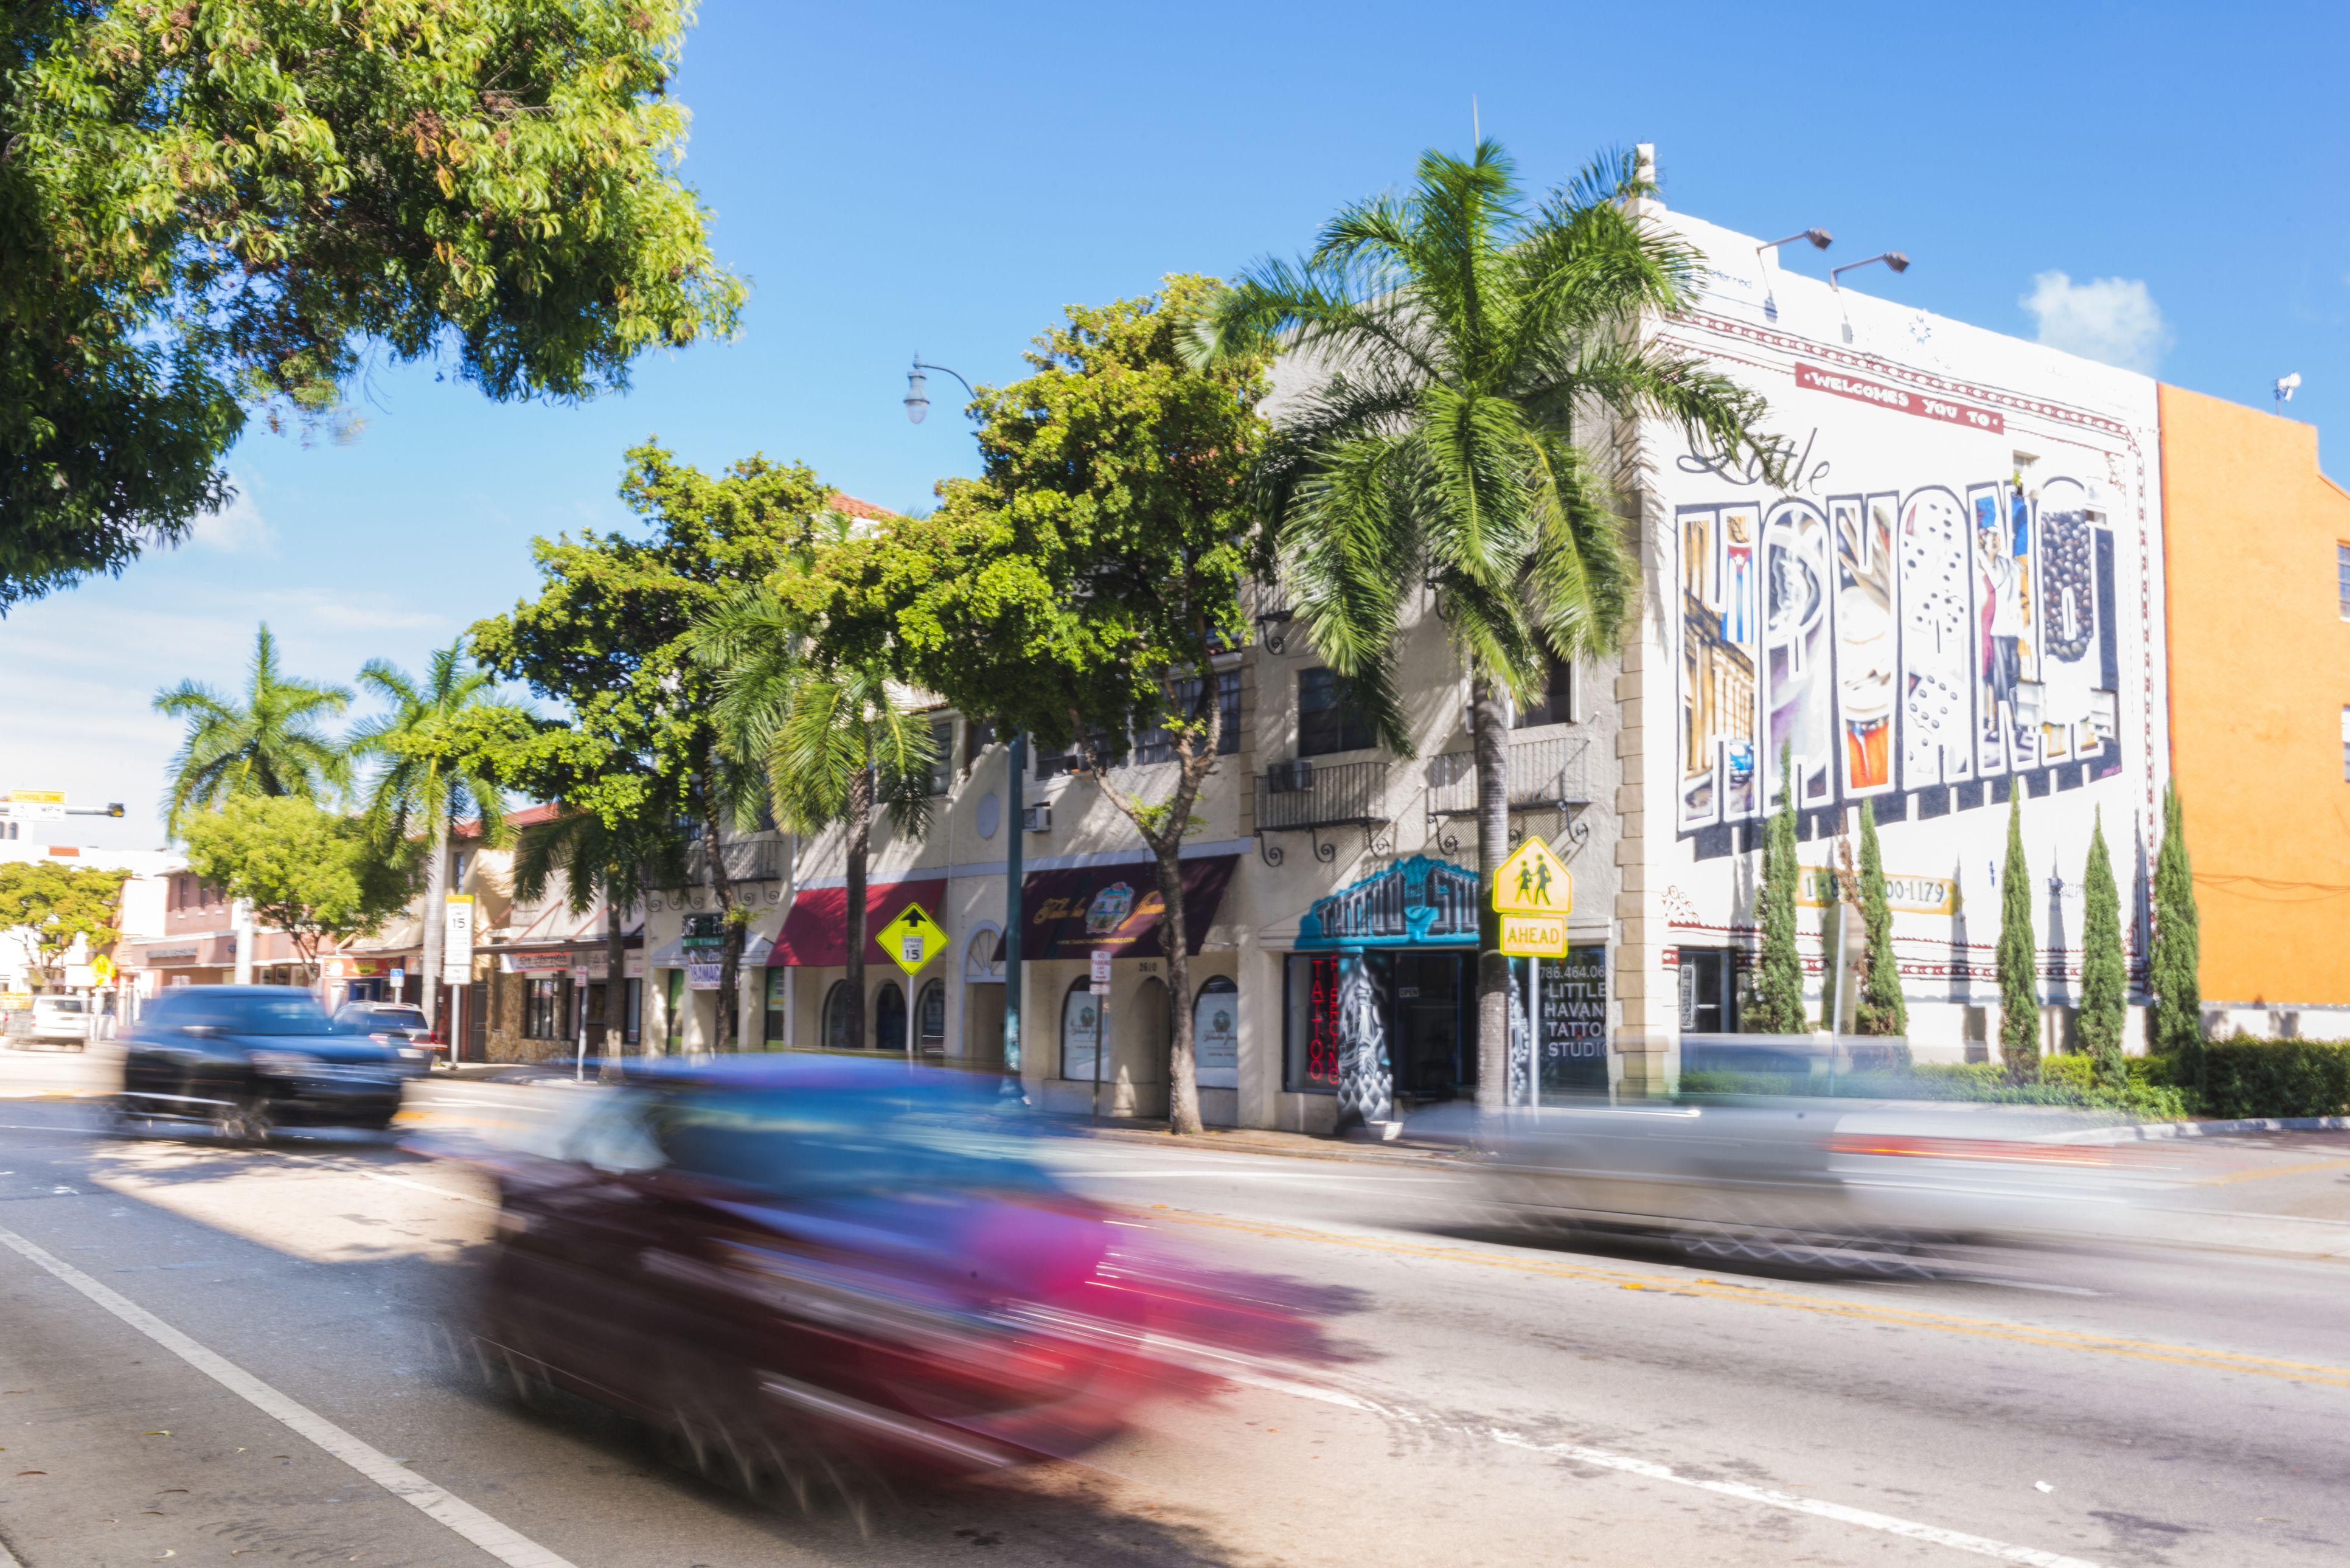 Miami Calle Ocho Little Havana Traffic Florida Travel Destination USA